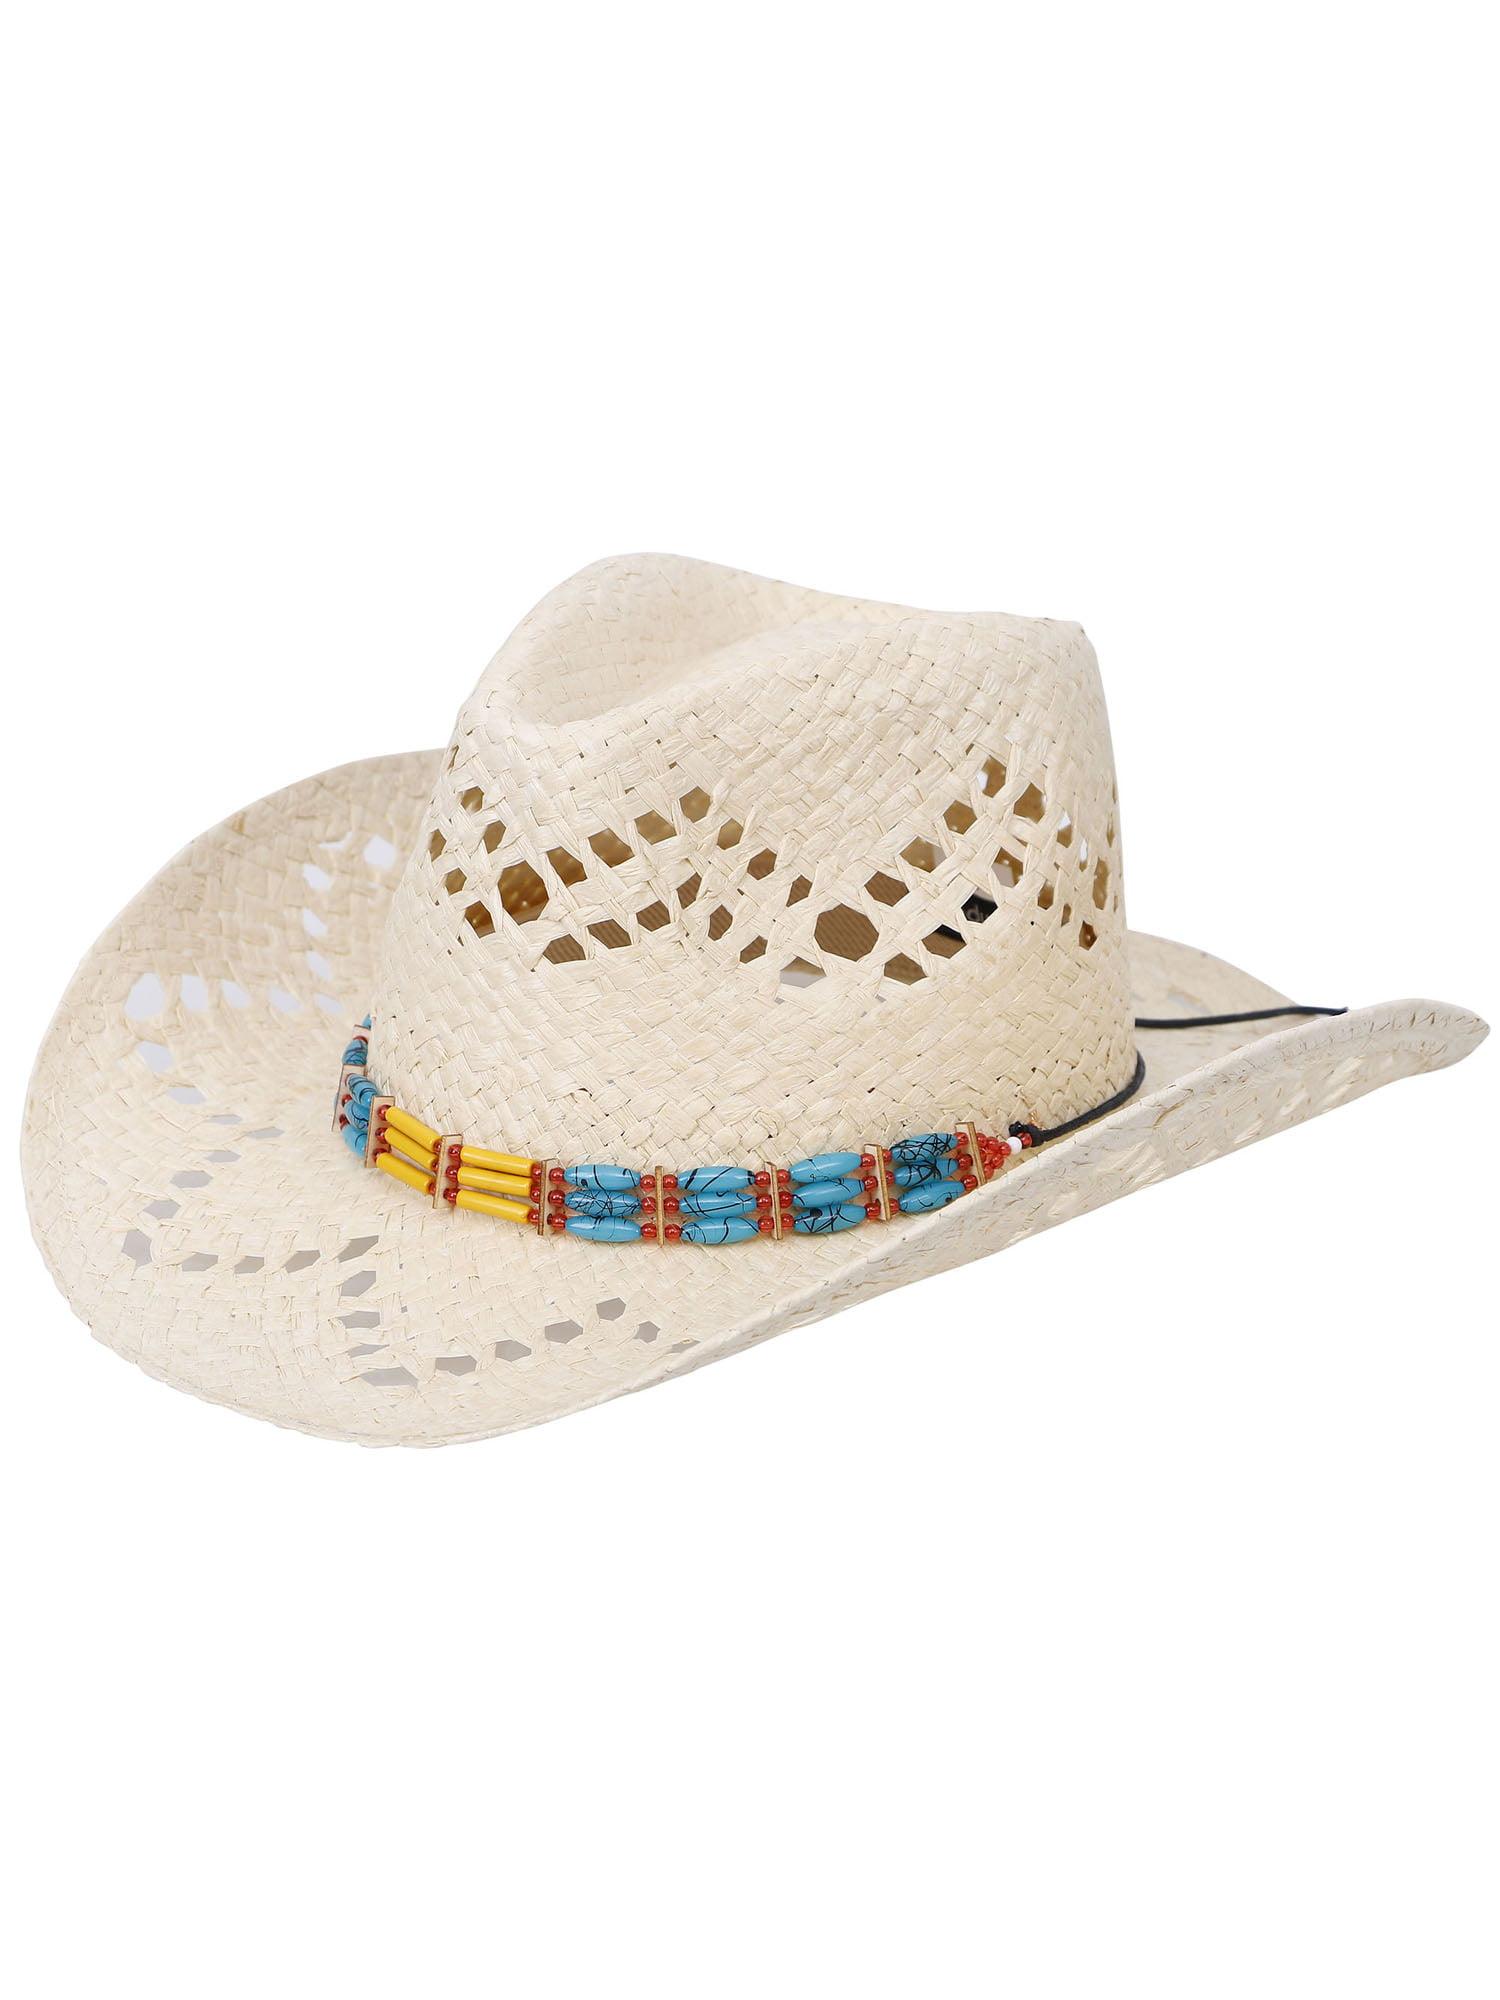 da6a068f Men's & Women's Western Style Cowboy / Cowgirl Straw Hat,Beige - Walmart.com